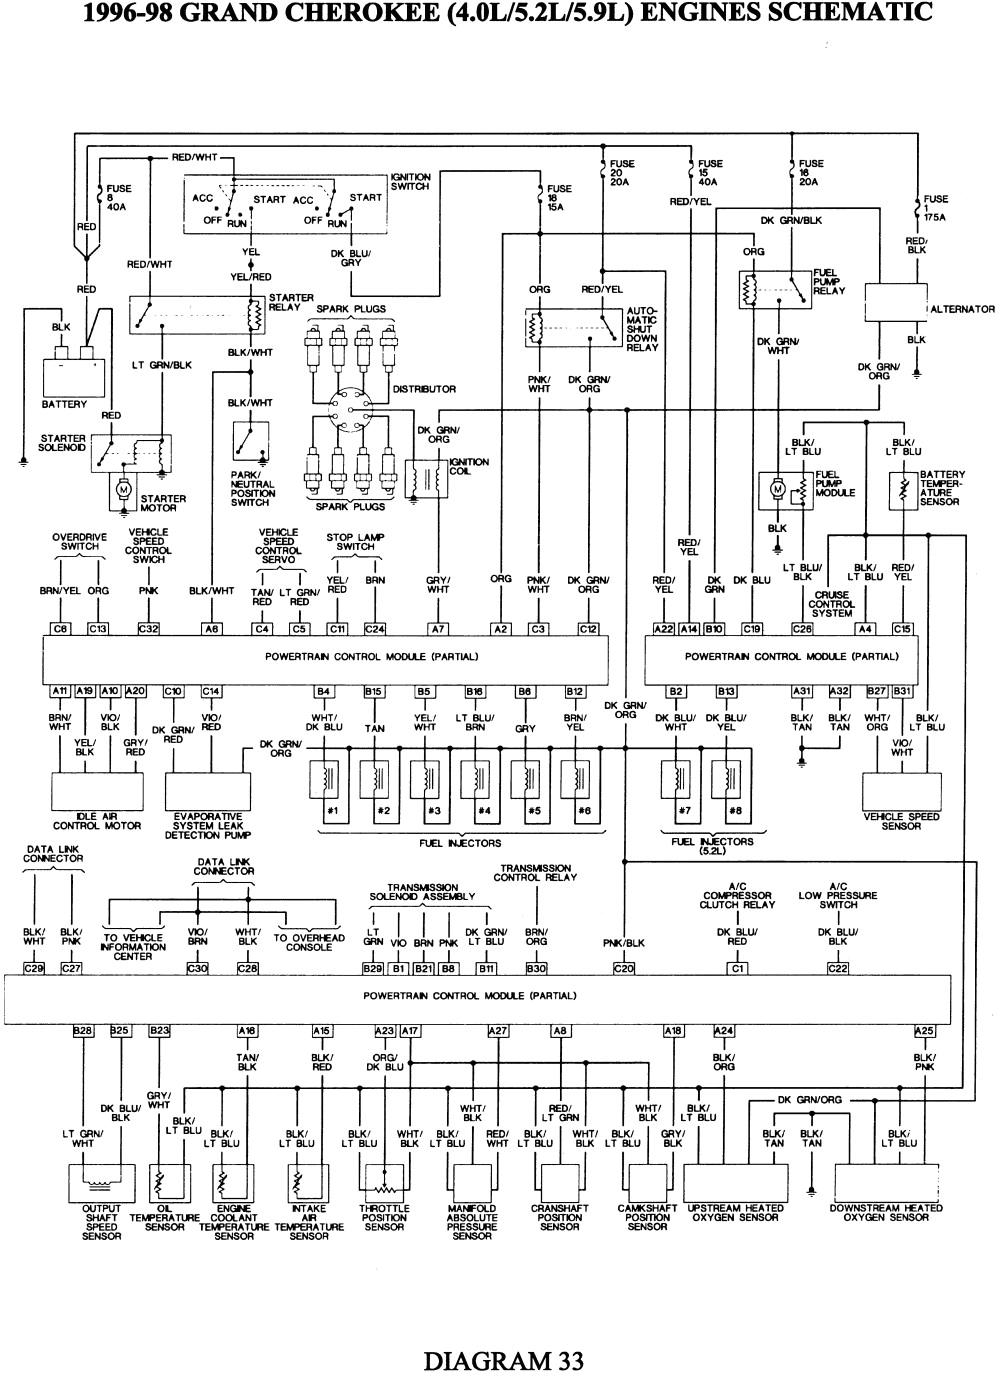 97 Jeep Cherokee Radio Wiring Diagram 1997 Jeep Cherokee Sport Fuse Diagram Wiring Diagram Used